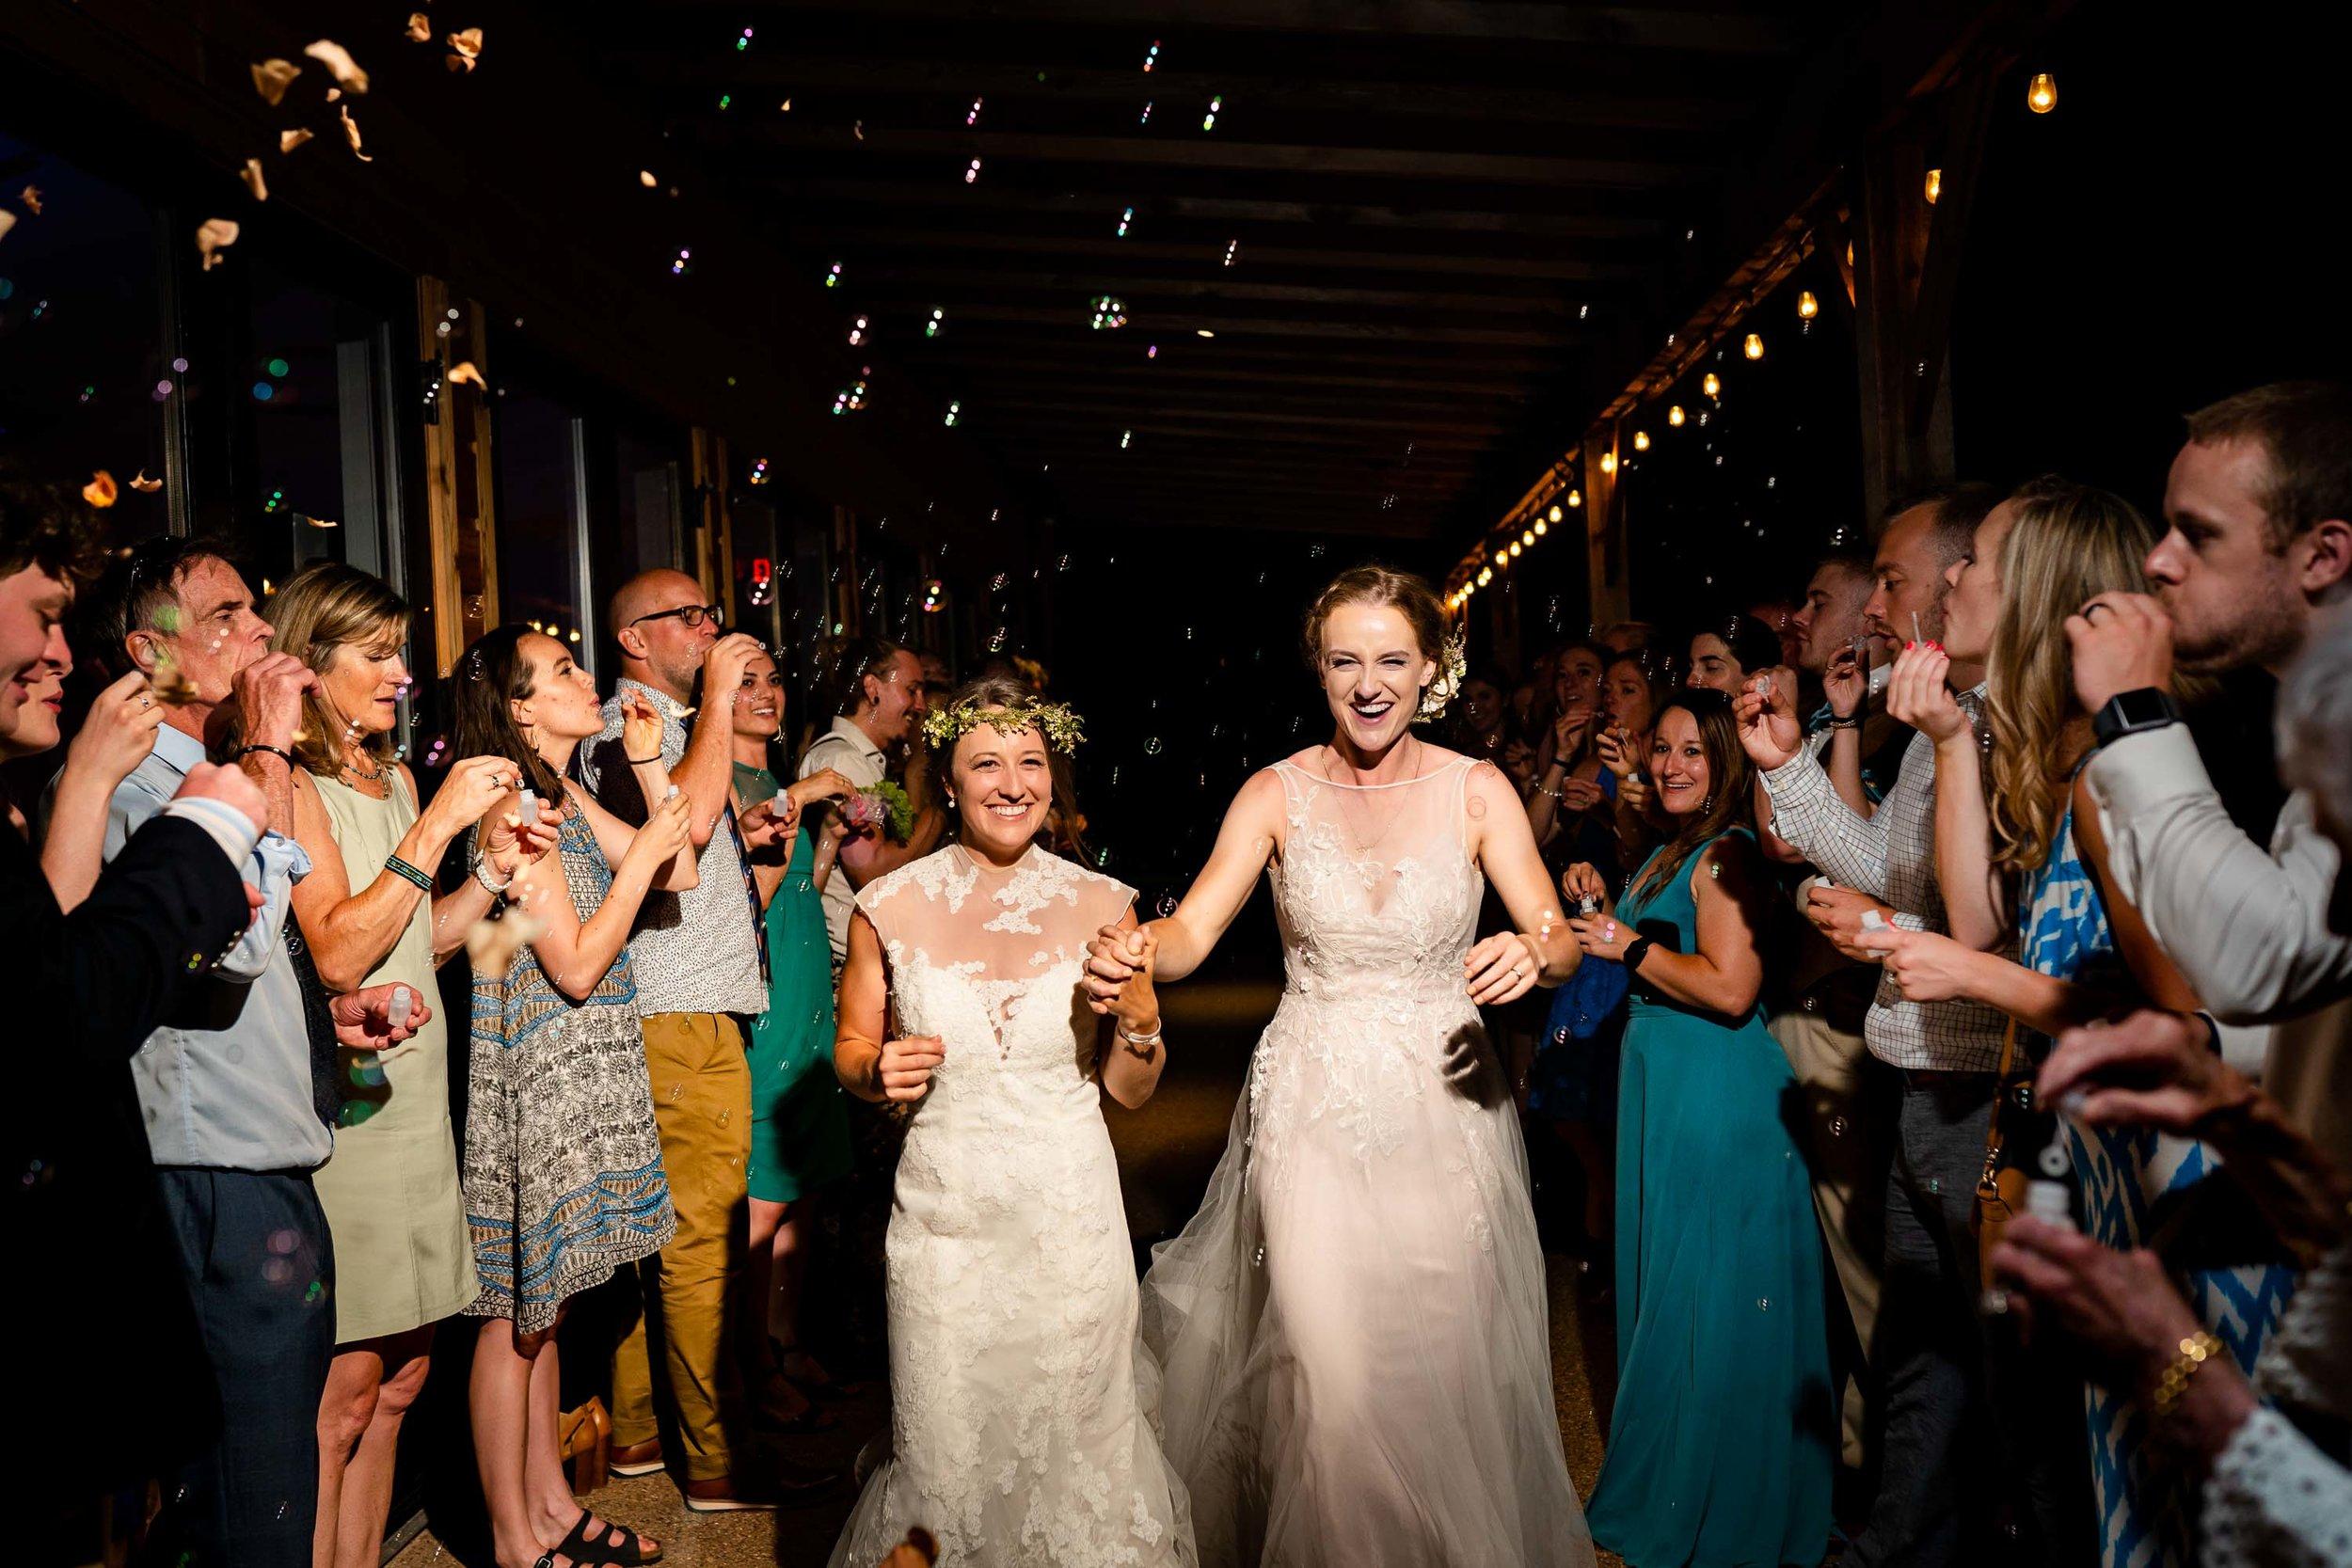 Rist_Canyon_Inn_Laporte_Wedding-233.jpg